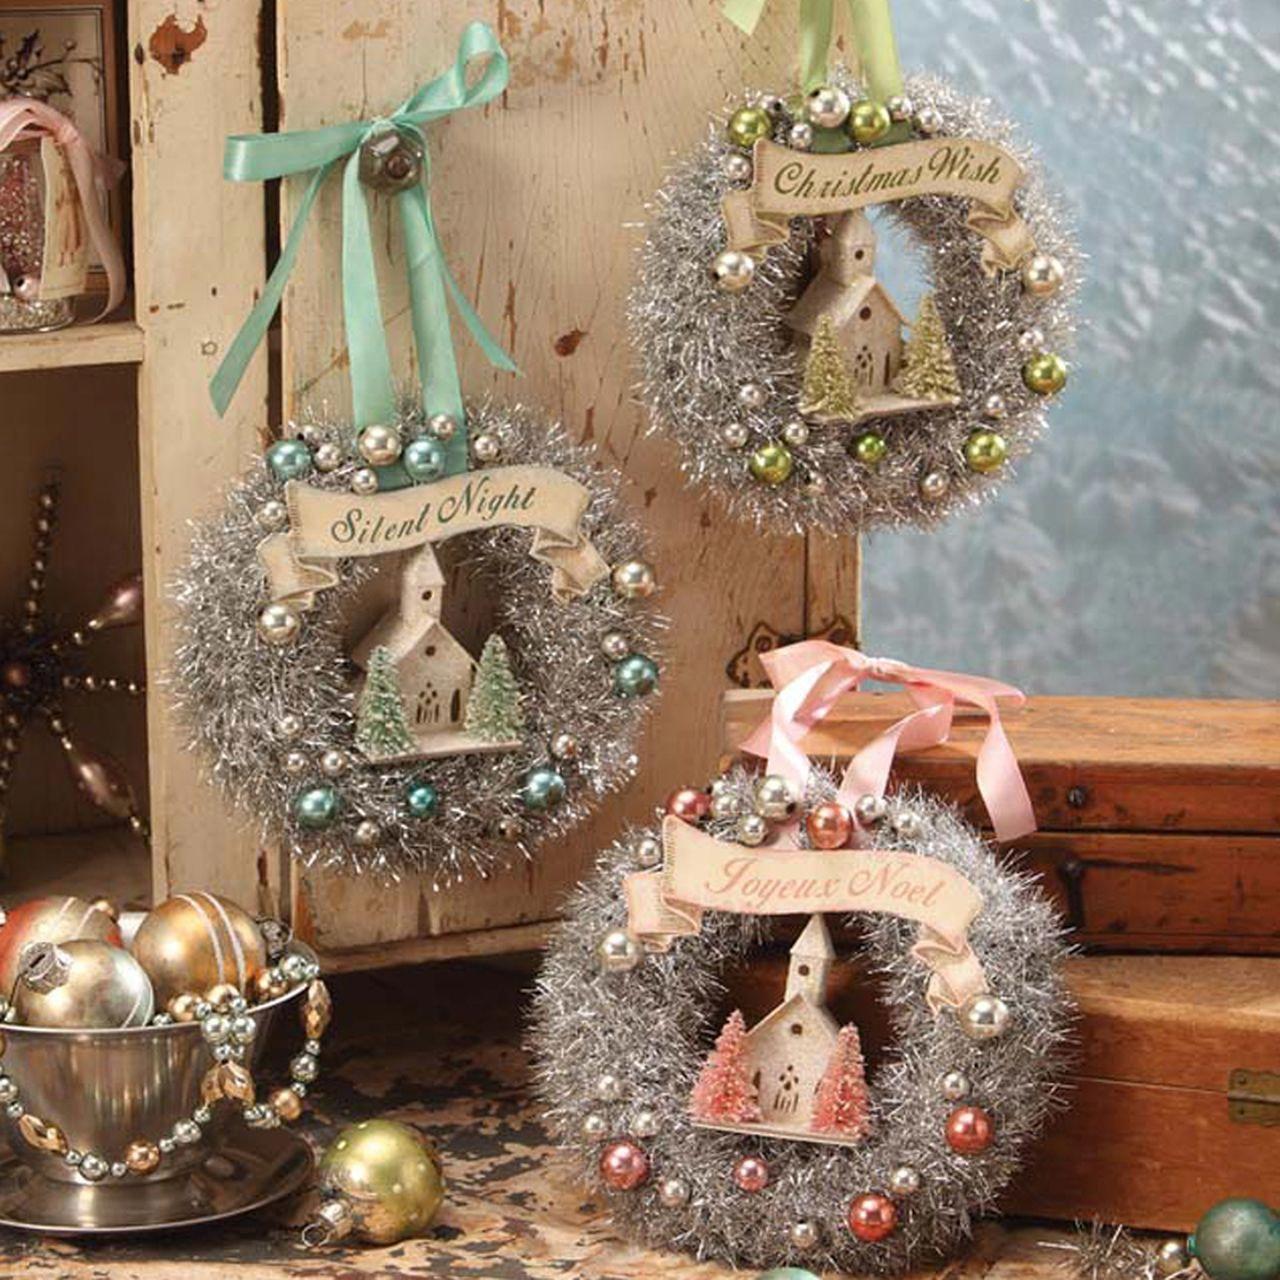 50 Creative Classy Diy Christmas Table Decoration Ideas In 2020 Christmas Wreaths Christmas Table Decorations Diy Diy Christmas Lights